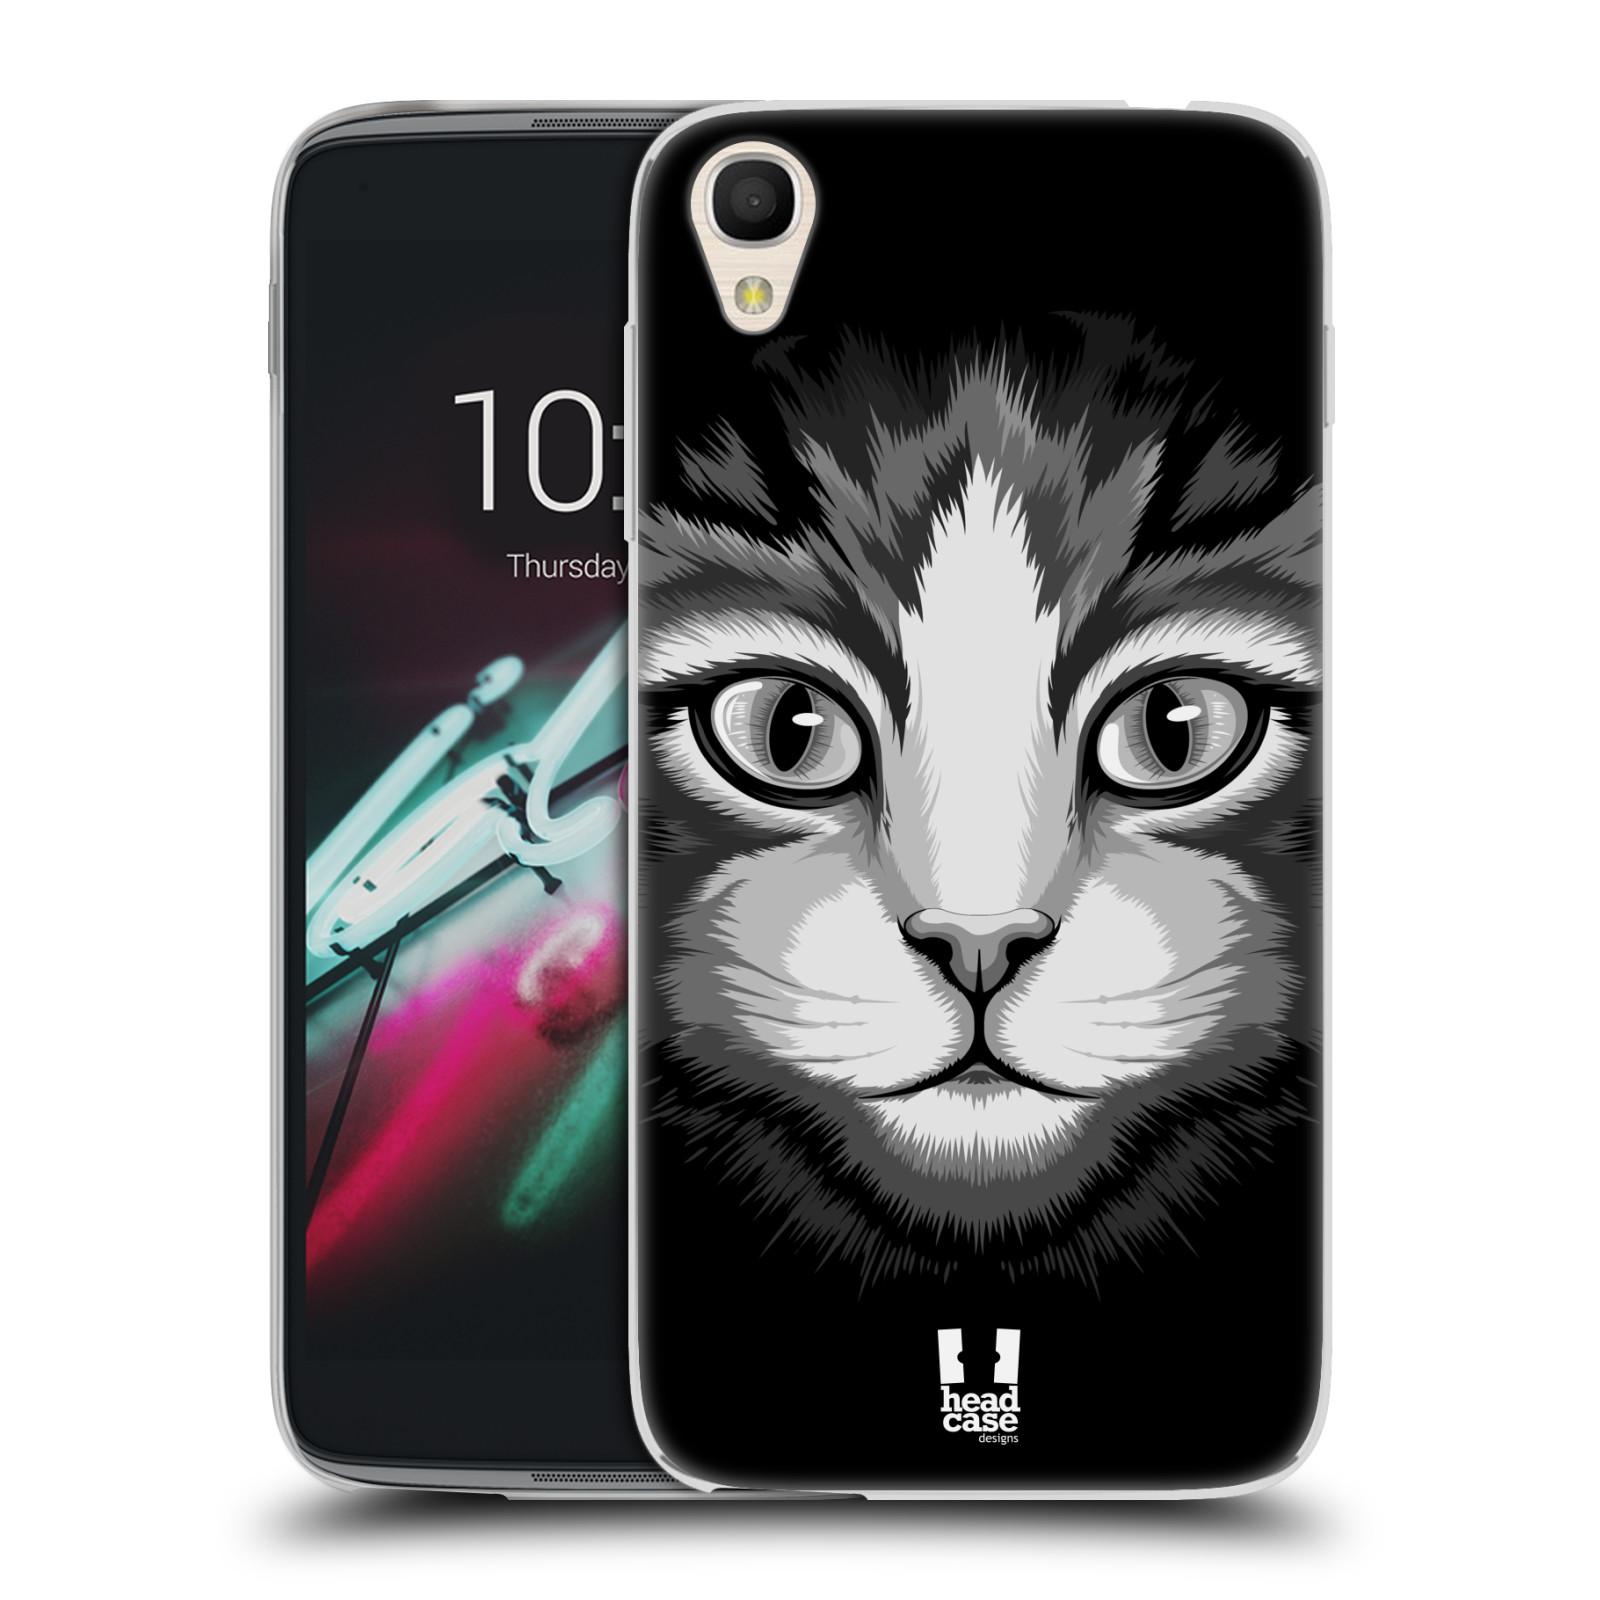 HEAD CASE silikonový obal na mobil Alcatel Idol 3 OT-6039Y (4.7) vzor Zvíře kreslená tvář 2 kočička